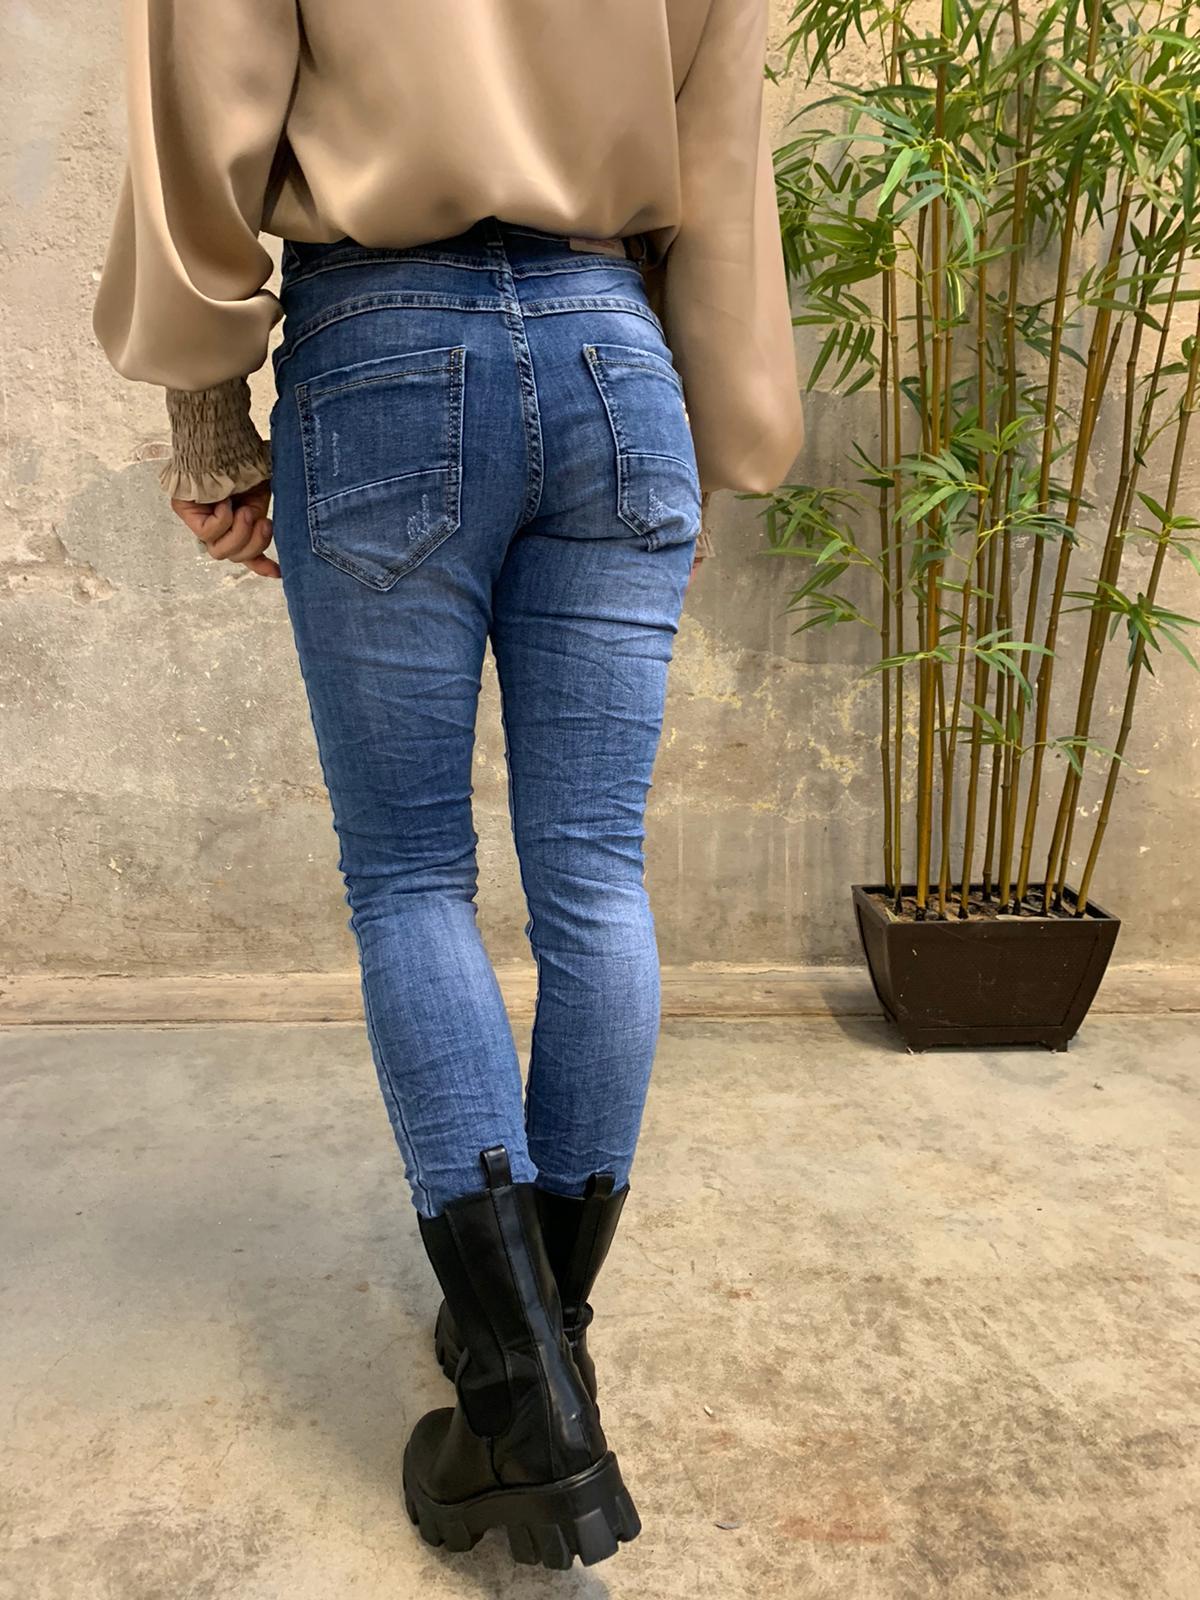 Jeans JW2648 - Denim bak